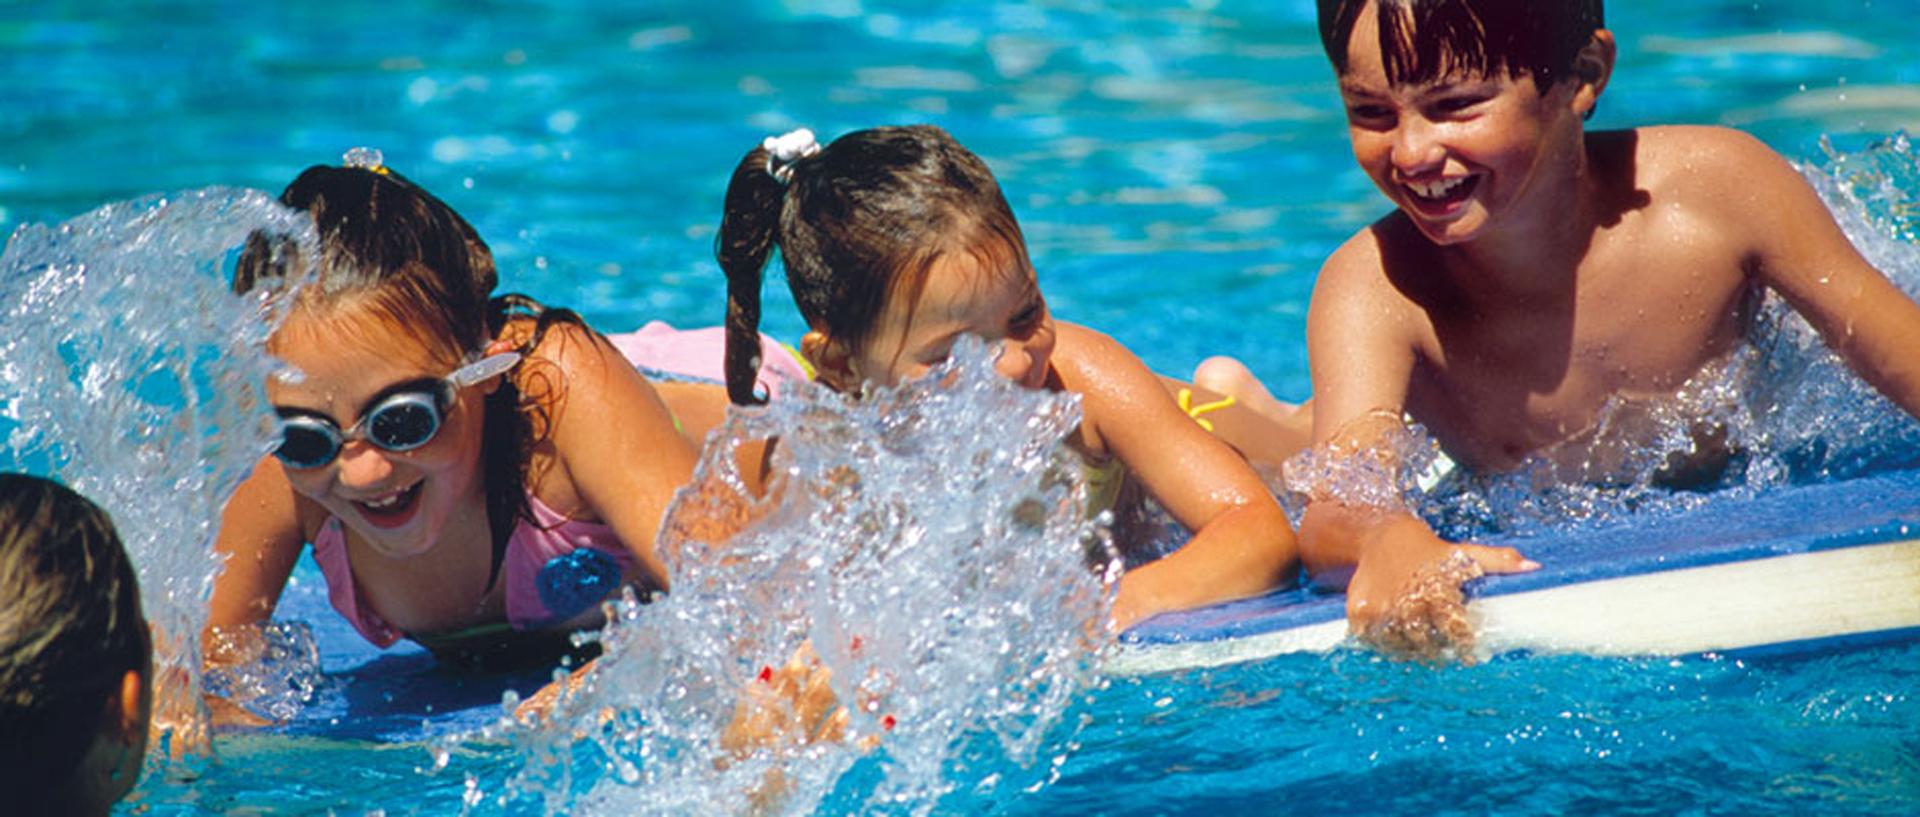 pool splash 2020